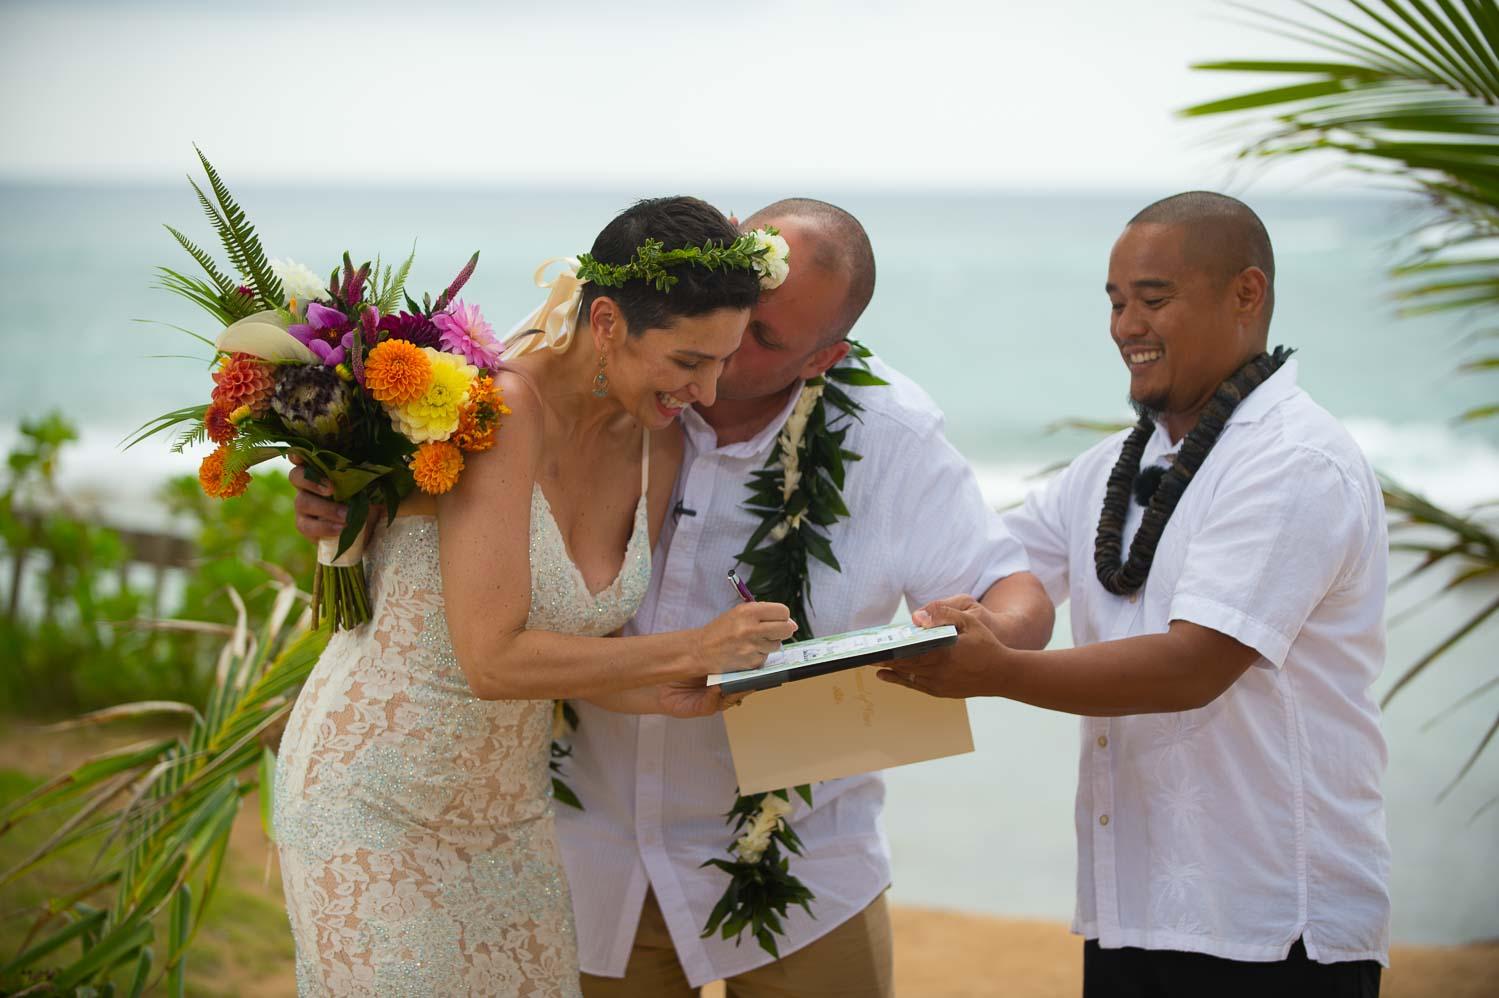 maui-wedding-photography-maui-wedding-venue-Tad-Craig-Photography-24.jpg